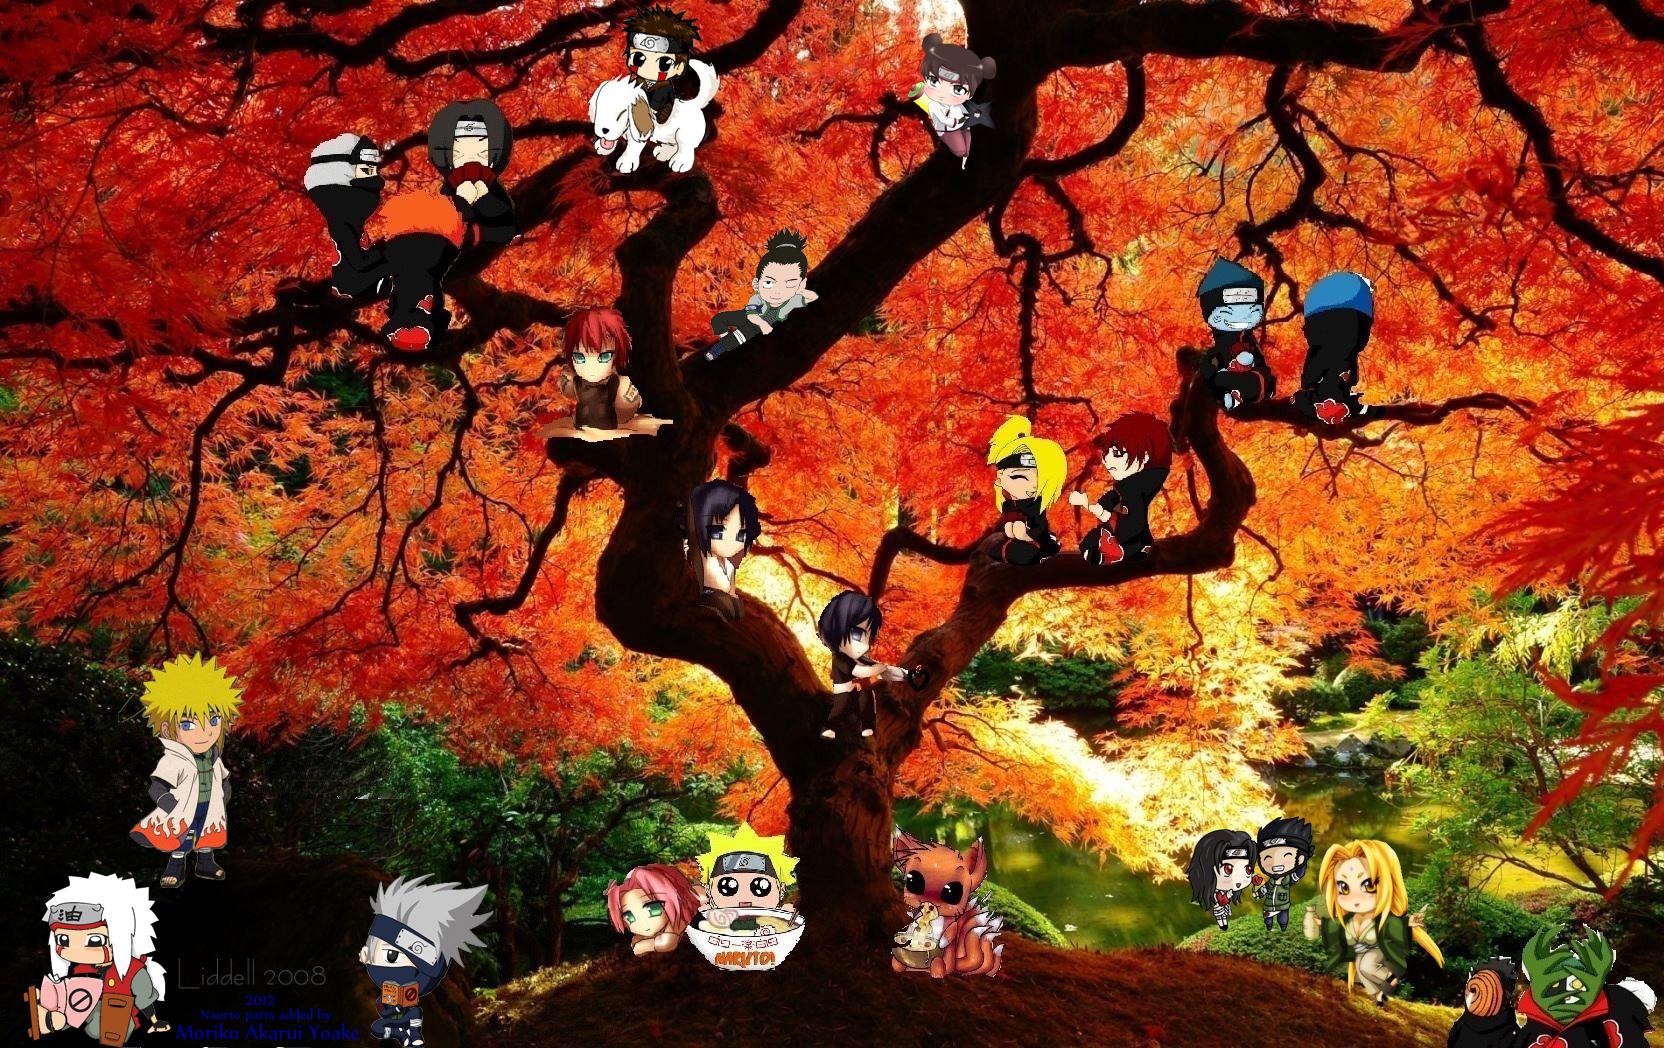 Naruto background I made - Moriko Yoake Gazette Jrock Stories! Gaara And Naruto Chibi